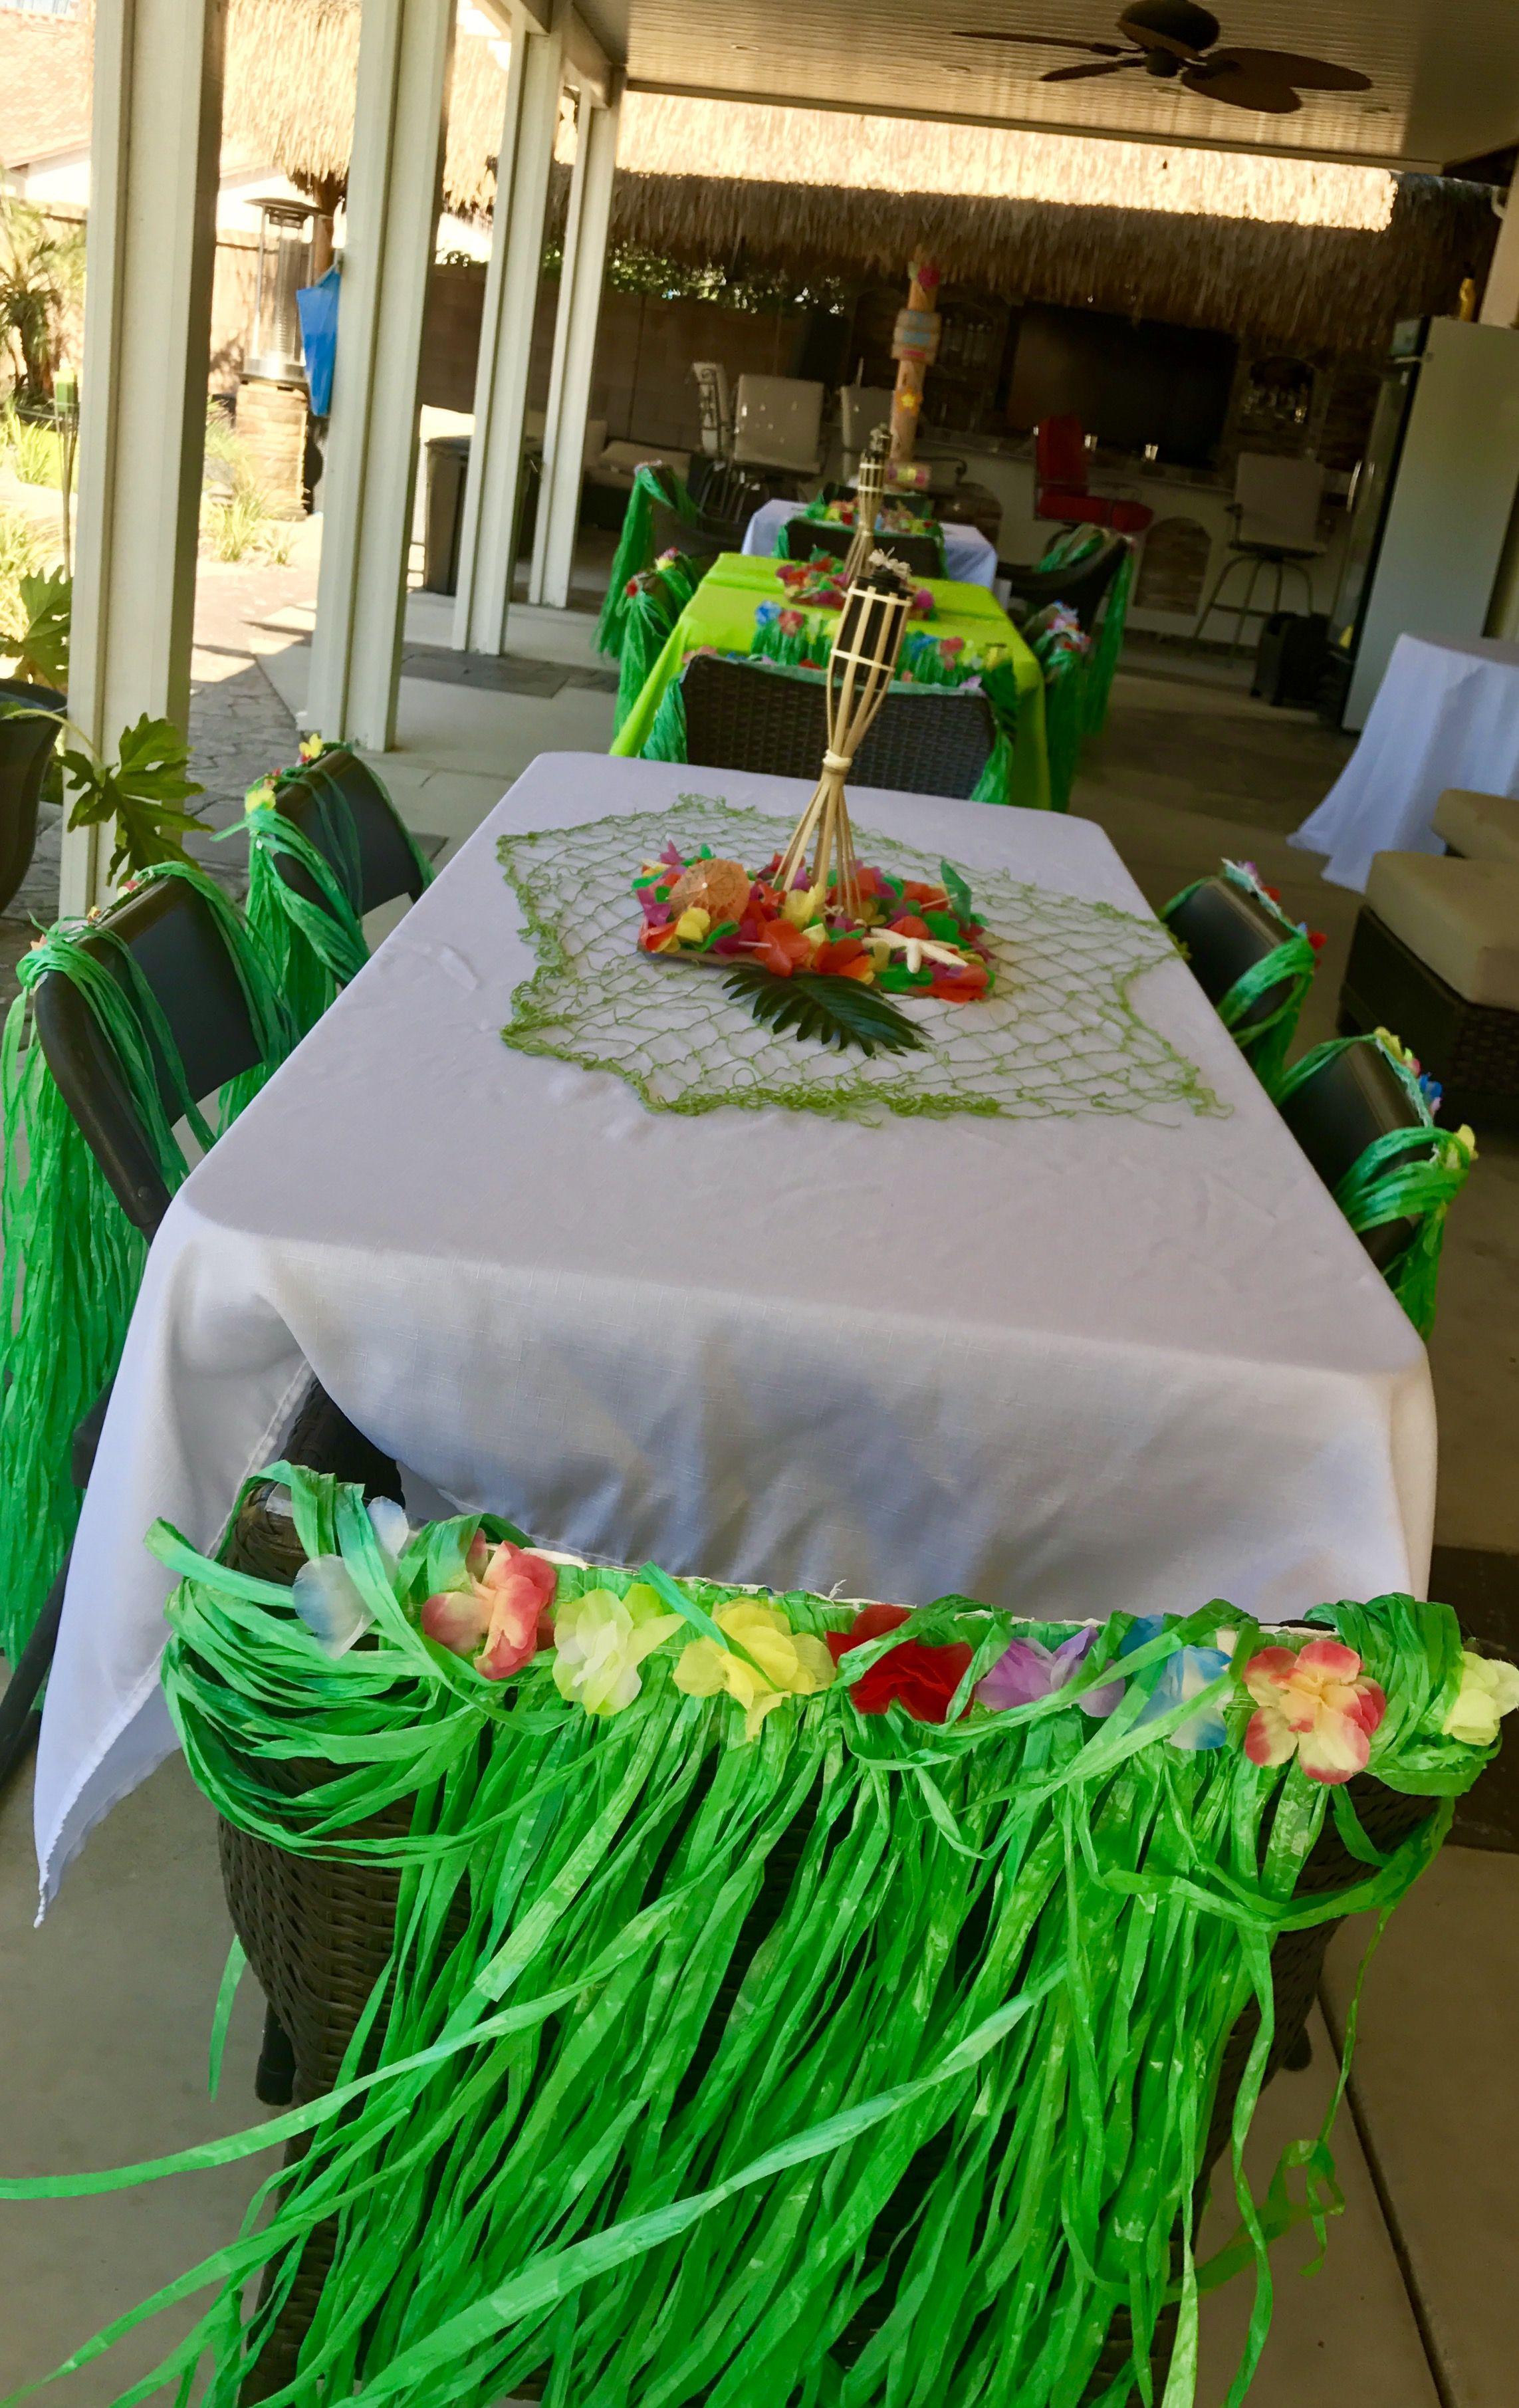 Luau Table Set Up Luau Decoration Ideas Luau Decorations Table Decorations Decor